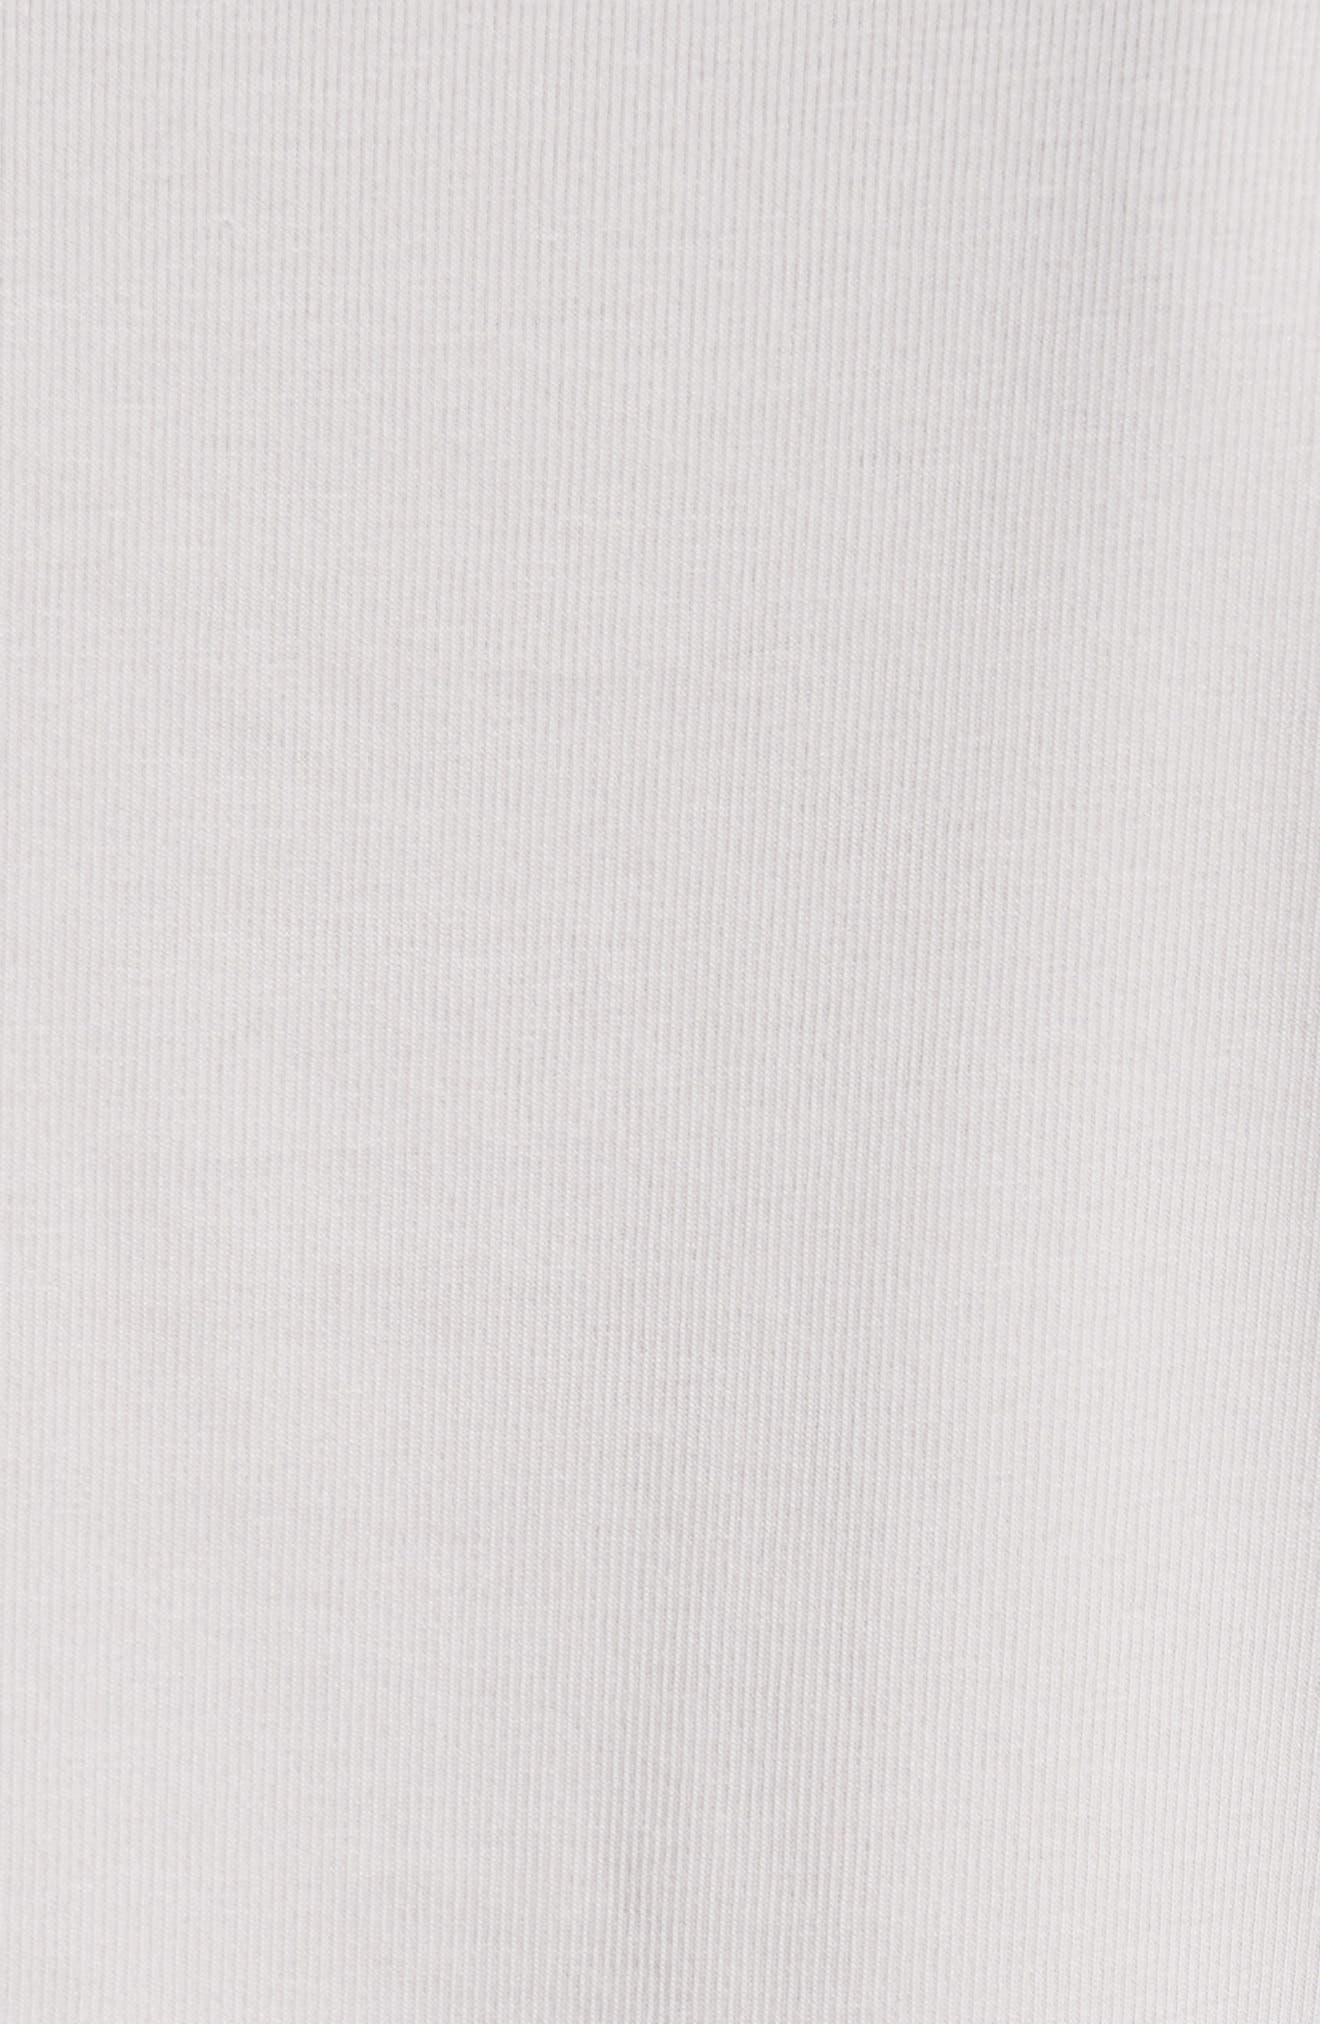 Beaded Crêpe de Chine Front Tank,                             Alternate thumbnail 5, color,                             050